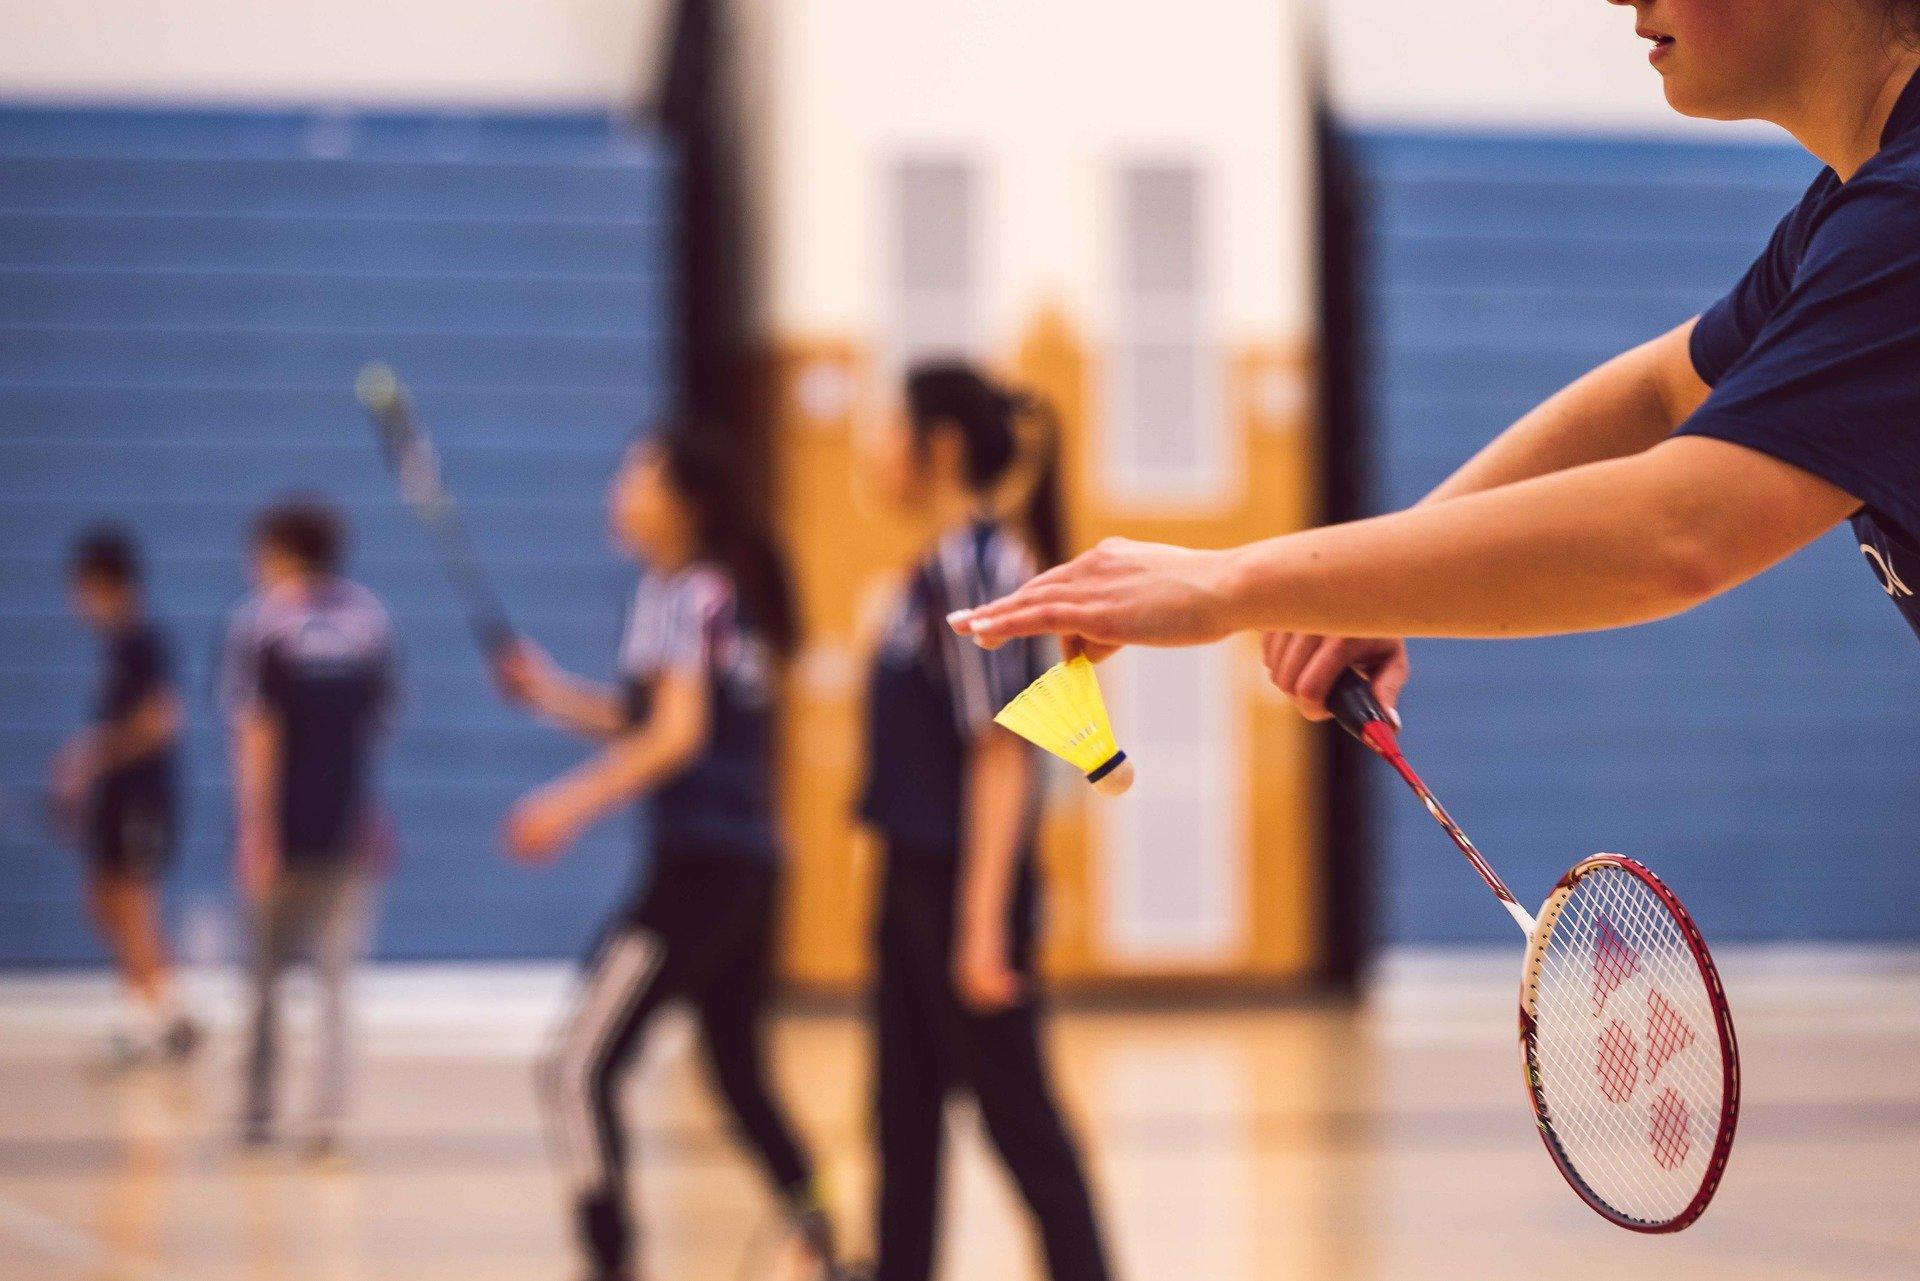 Rentabiliser un club de sport : un défi